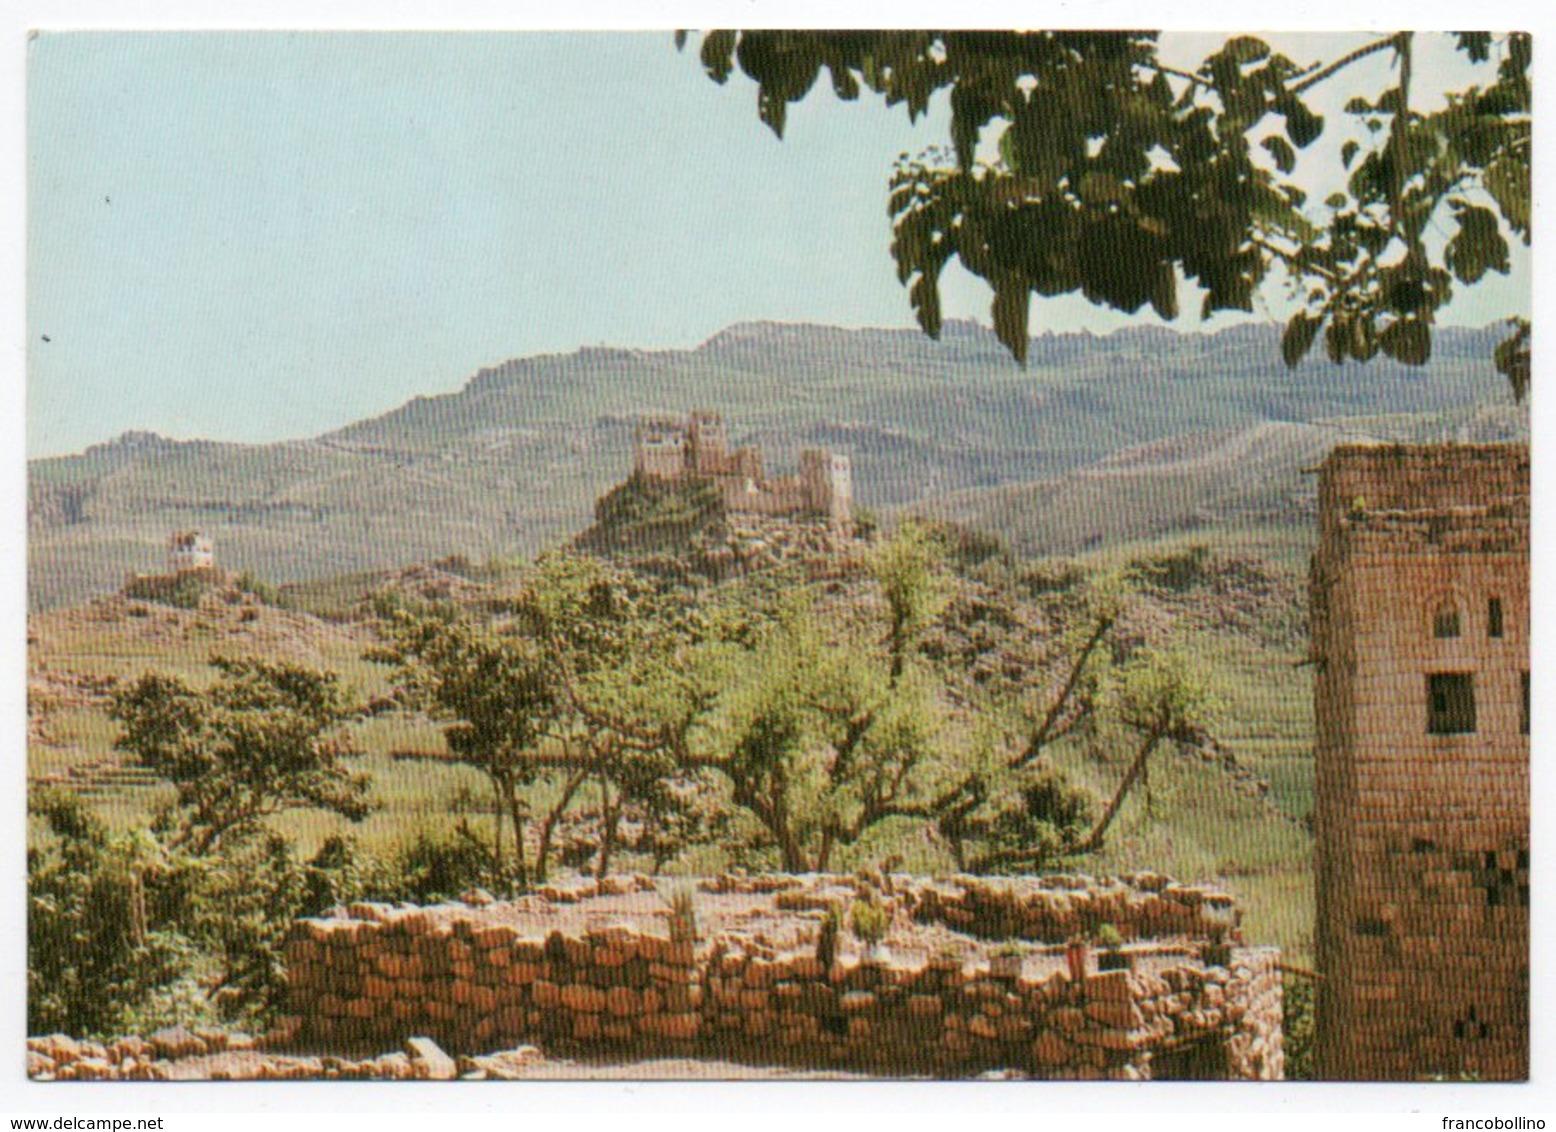 YEMEN A.R. - A VIEW OF ALGROUN VILLAGE ALMAHWEET / THEMATIC STAMPS-COFFEE - Yemen